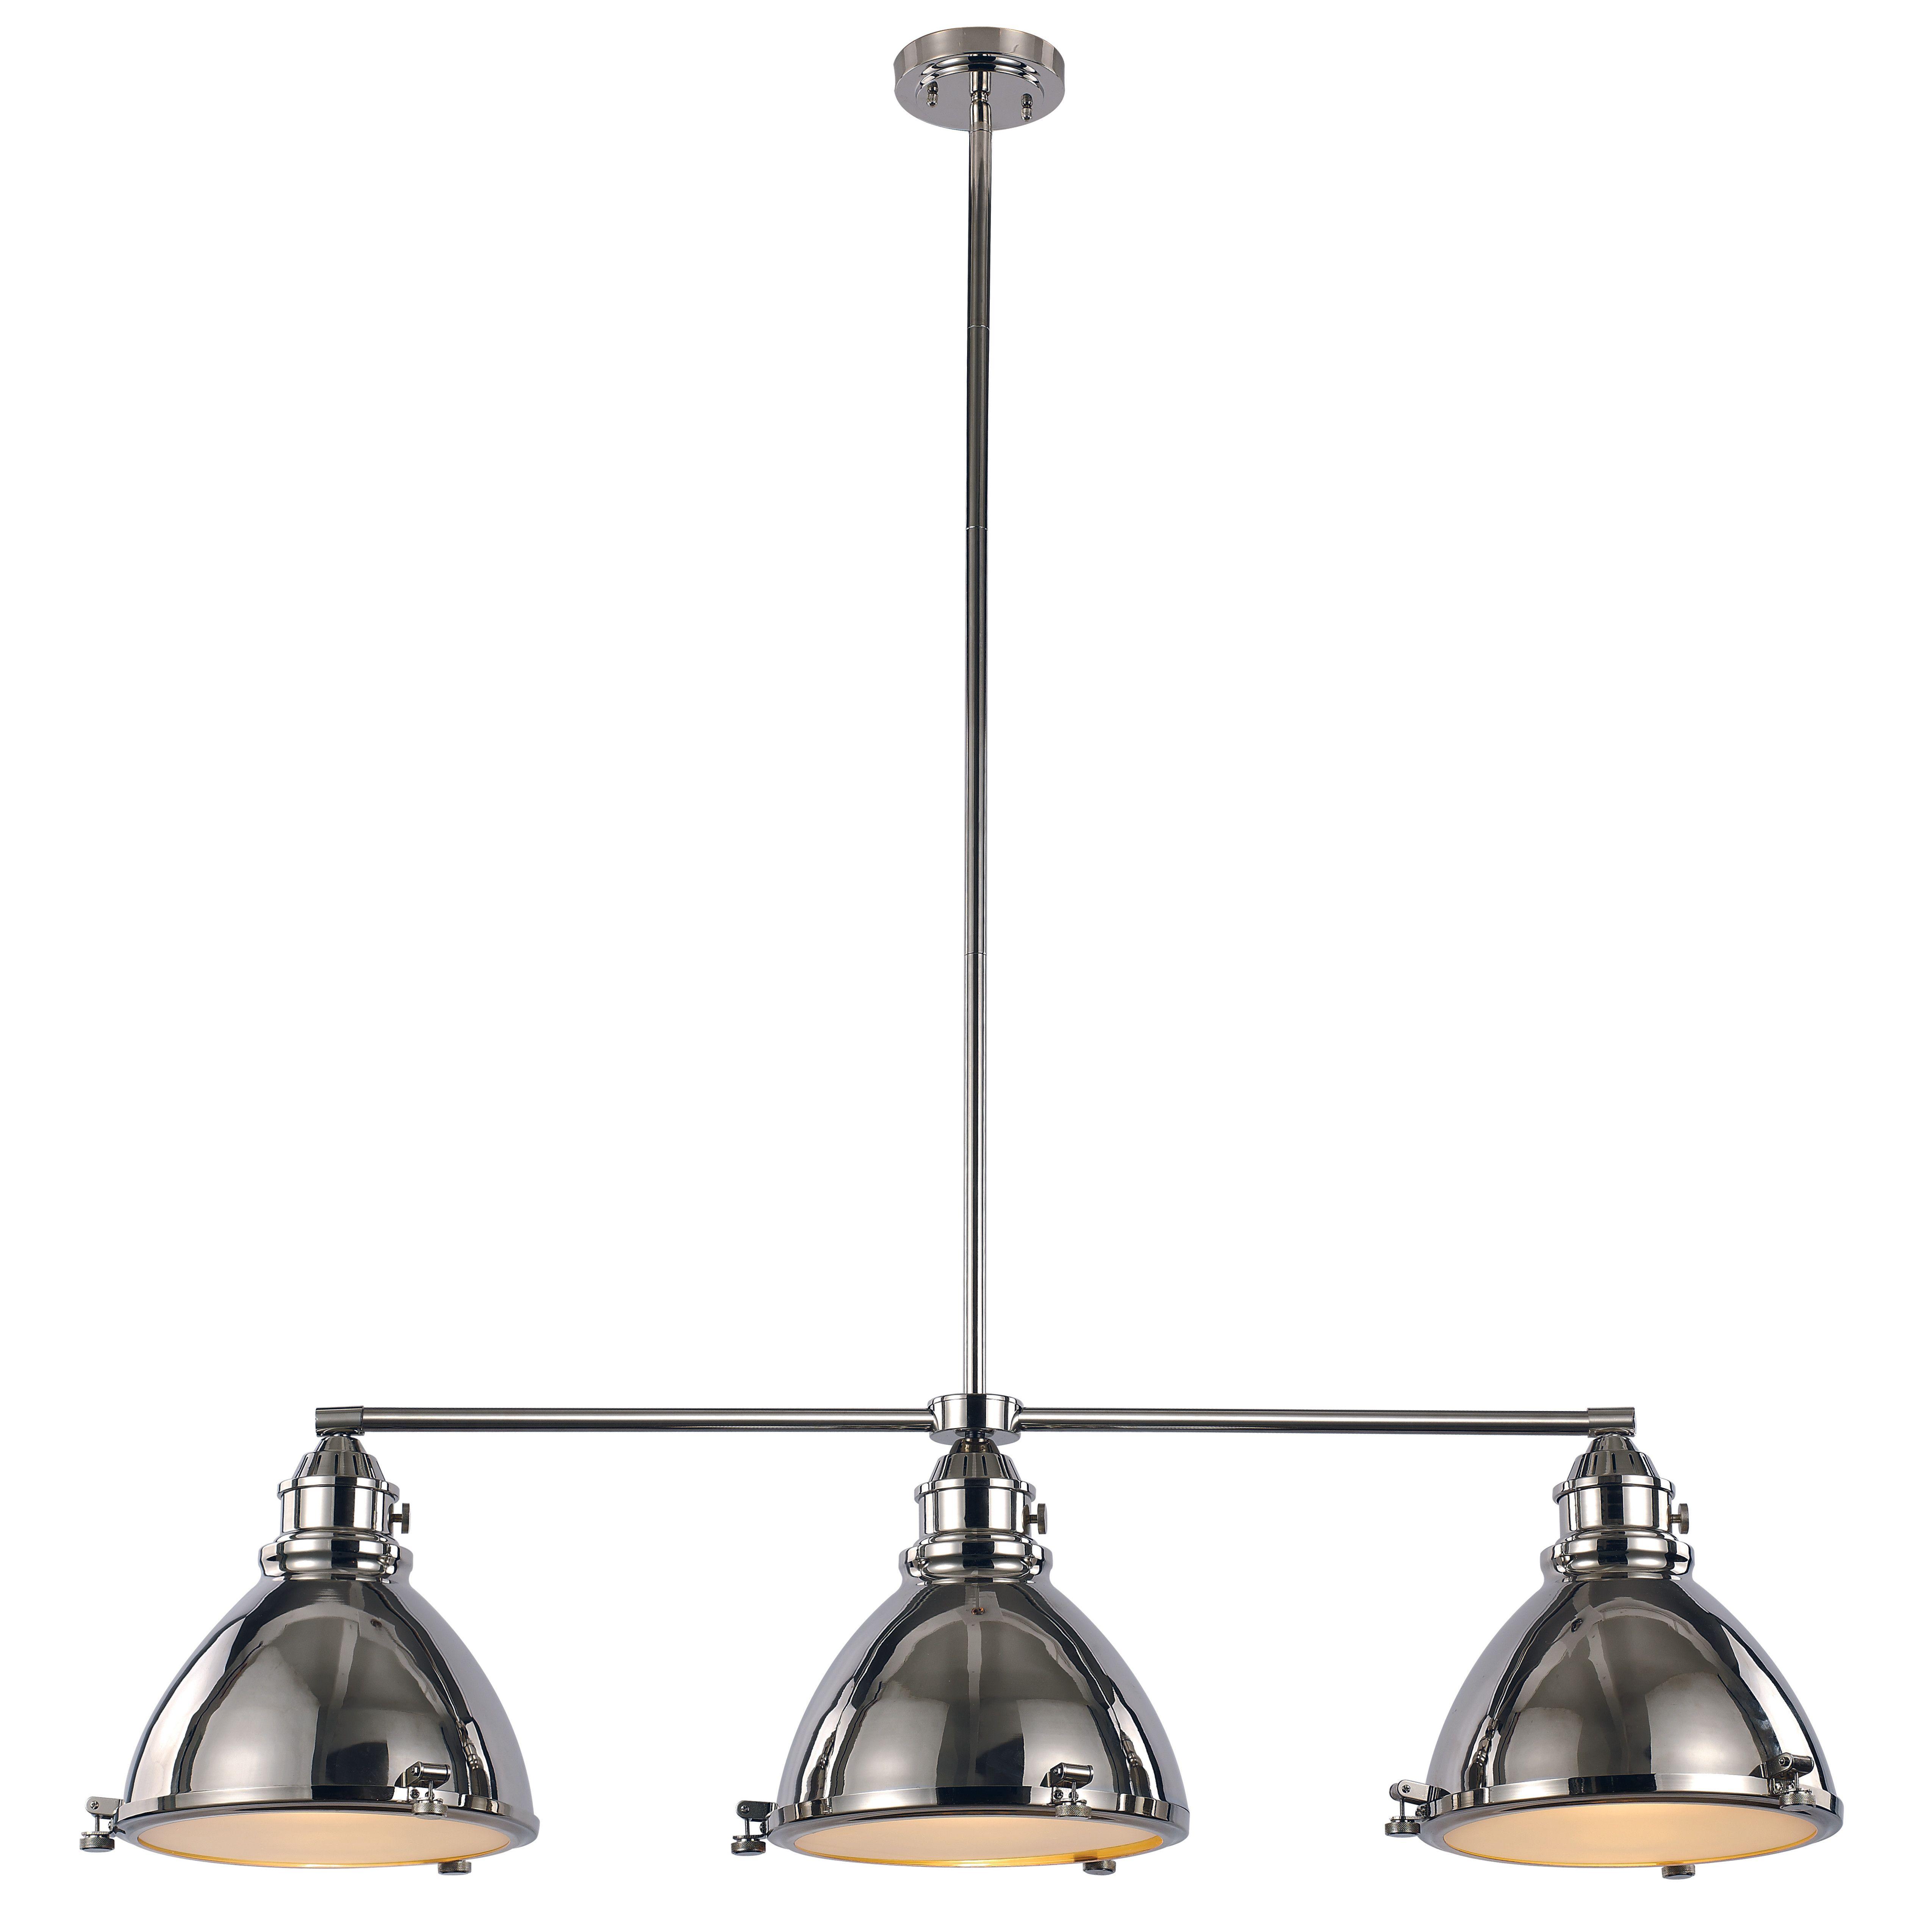 Dewey 3 Light Kitchen Island Pendant | Living Space | Island With Regard To Irwin 1 Light Single Globe Pendants (View 5 of 30)